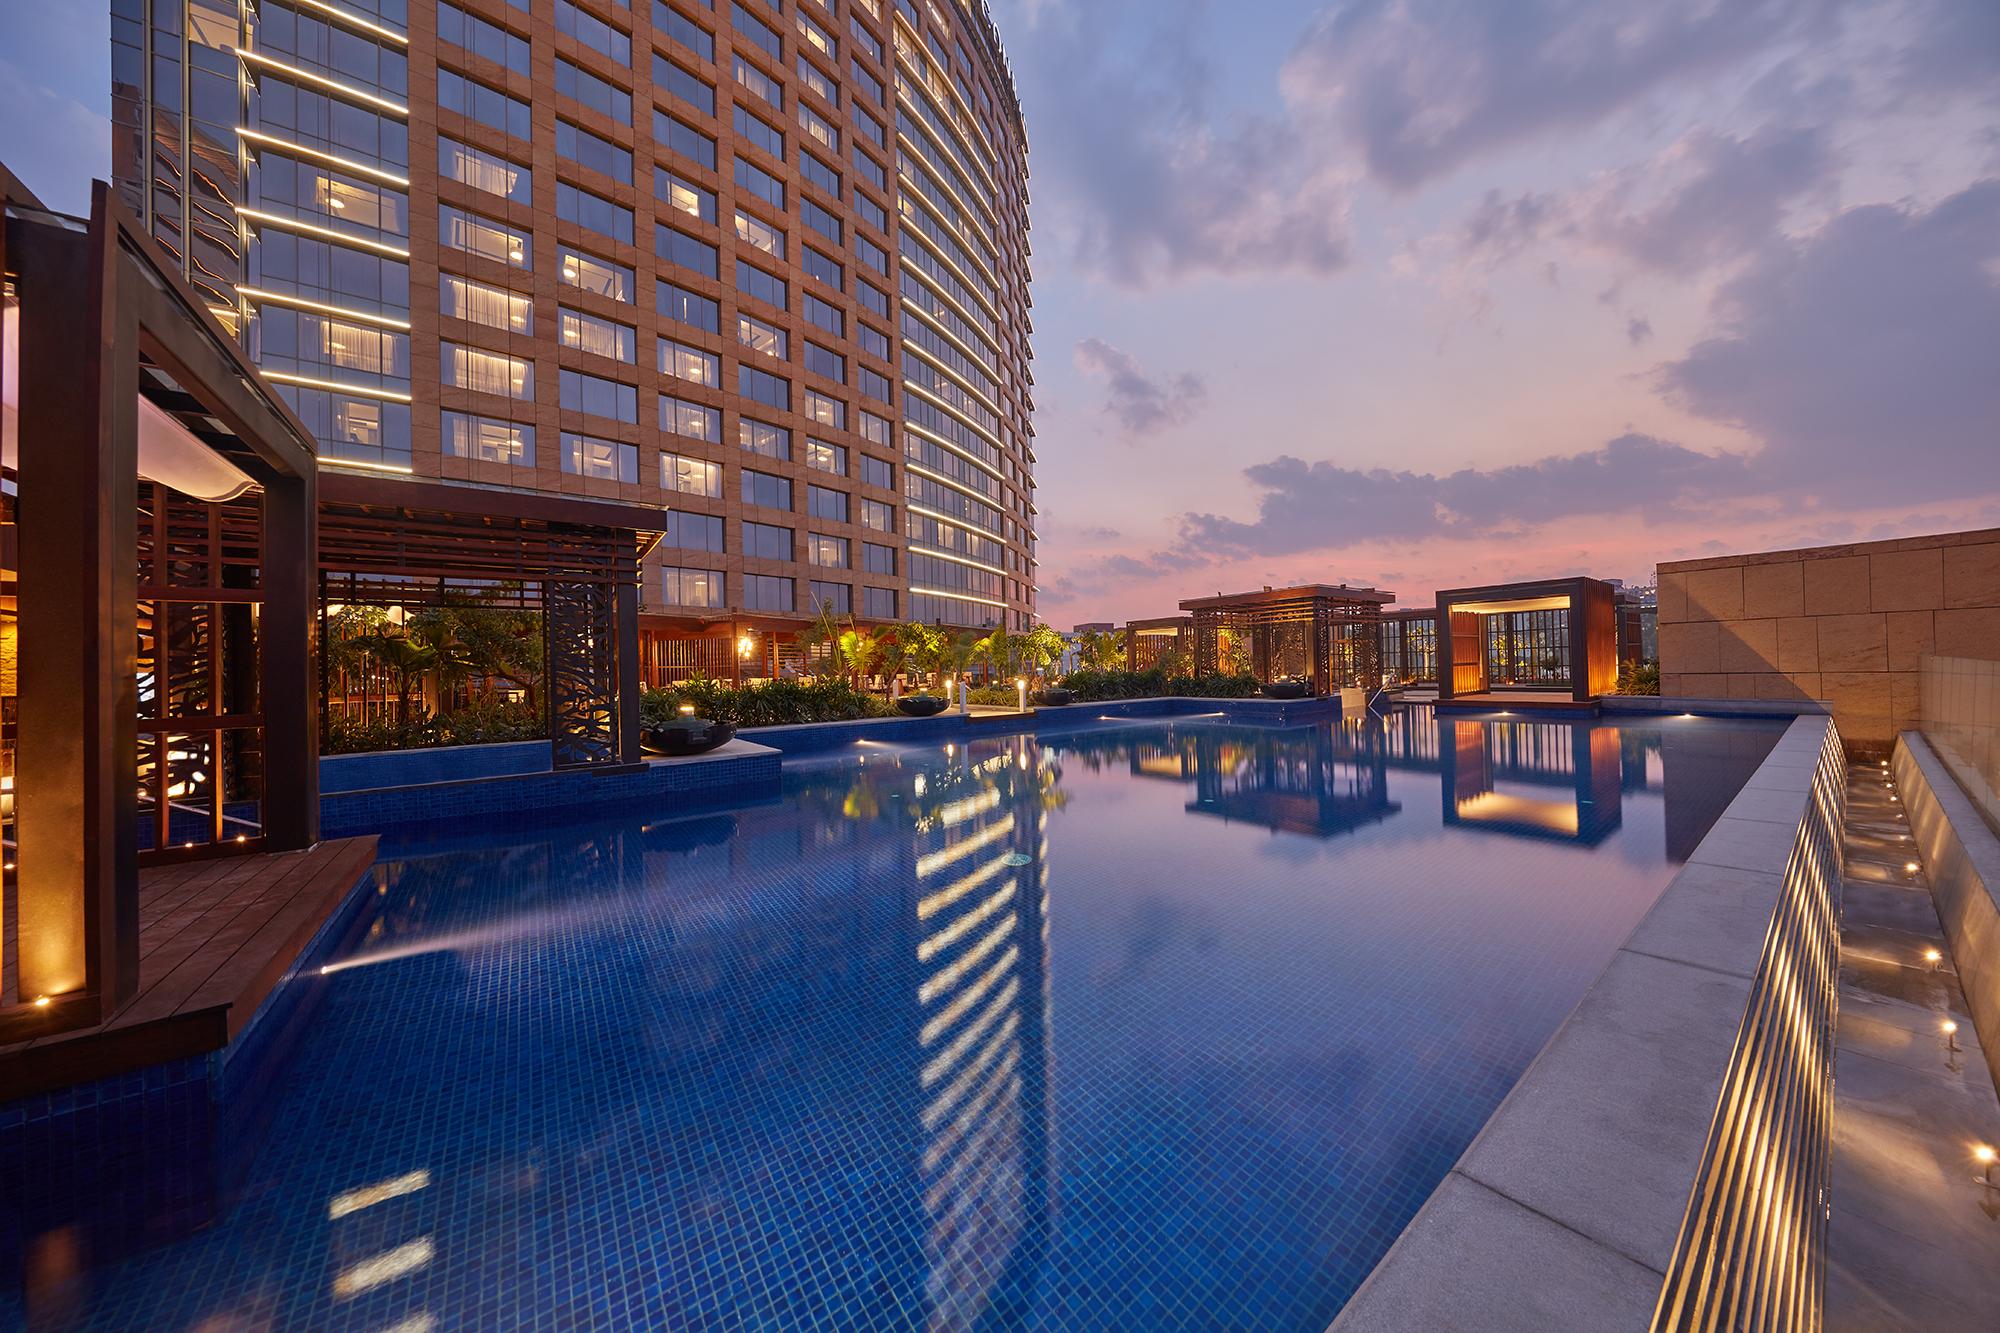 Conrad Hilton Hotel Bangalore